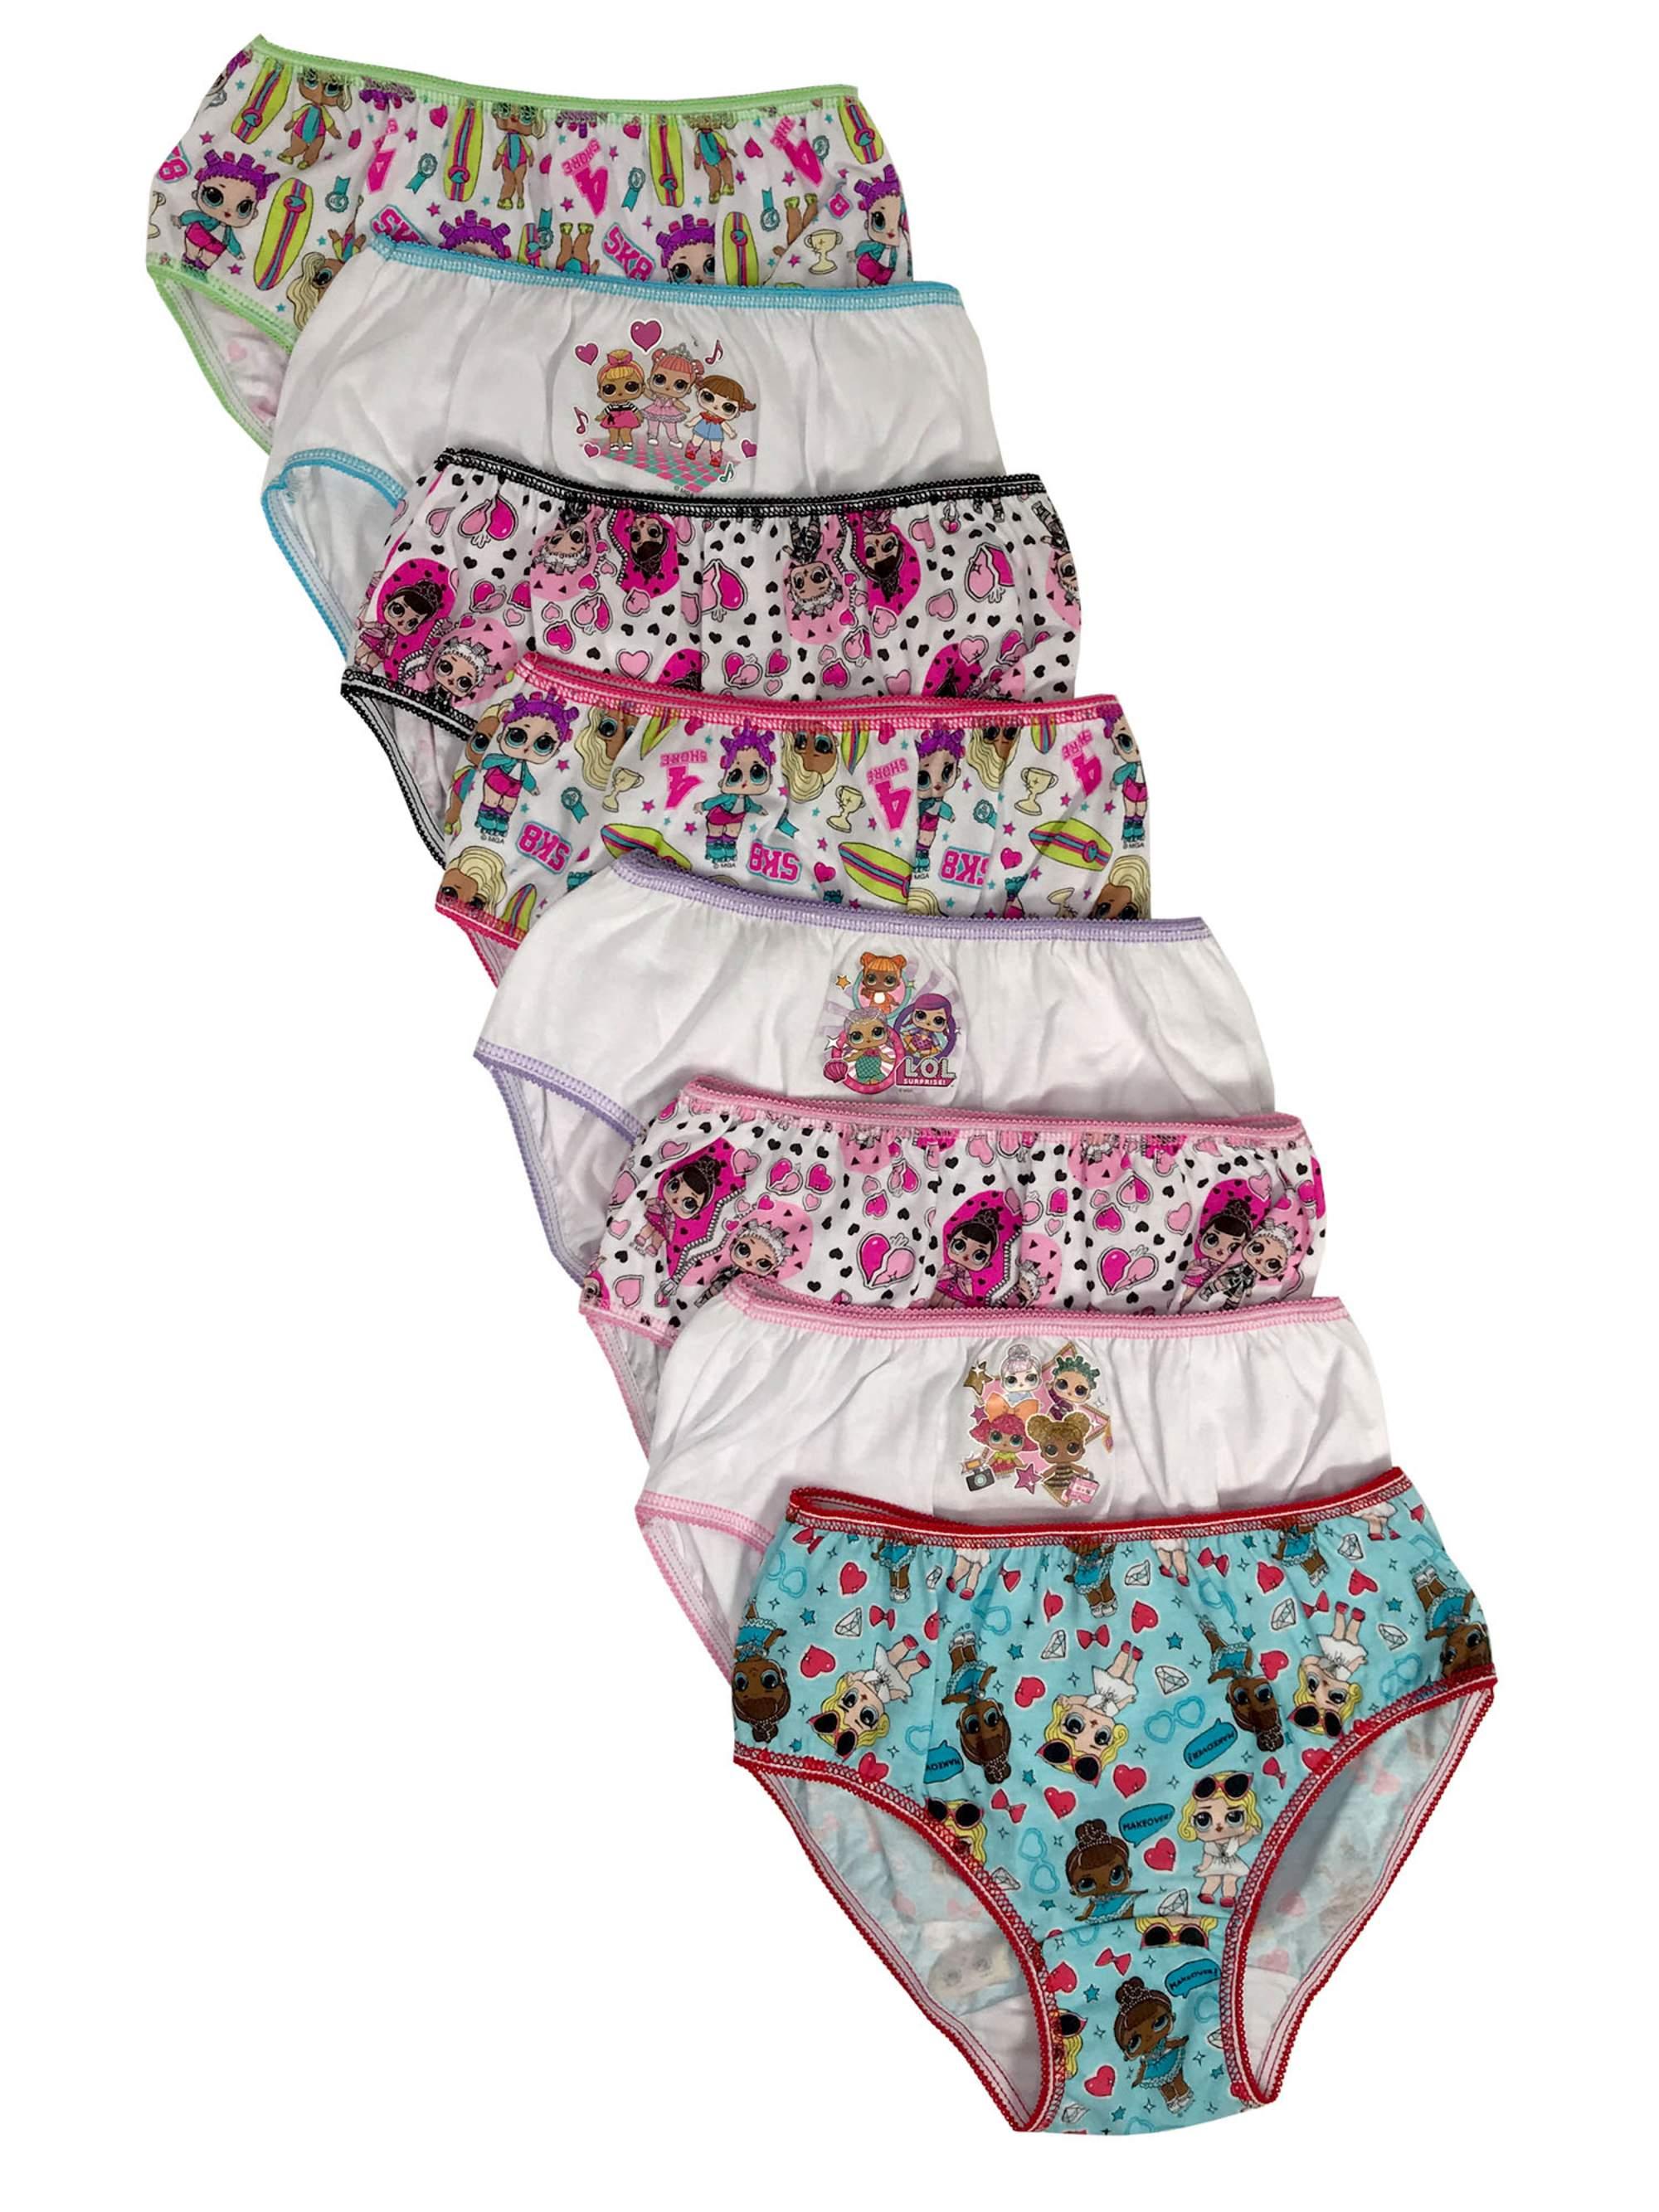 L.O.L. Surprise Panties, 7+1 Bonus Pack (Little Girls & Big Girls)